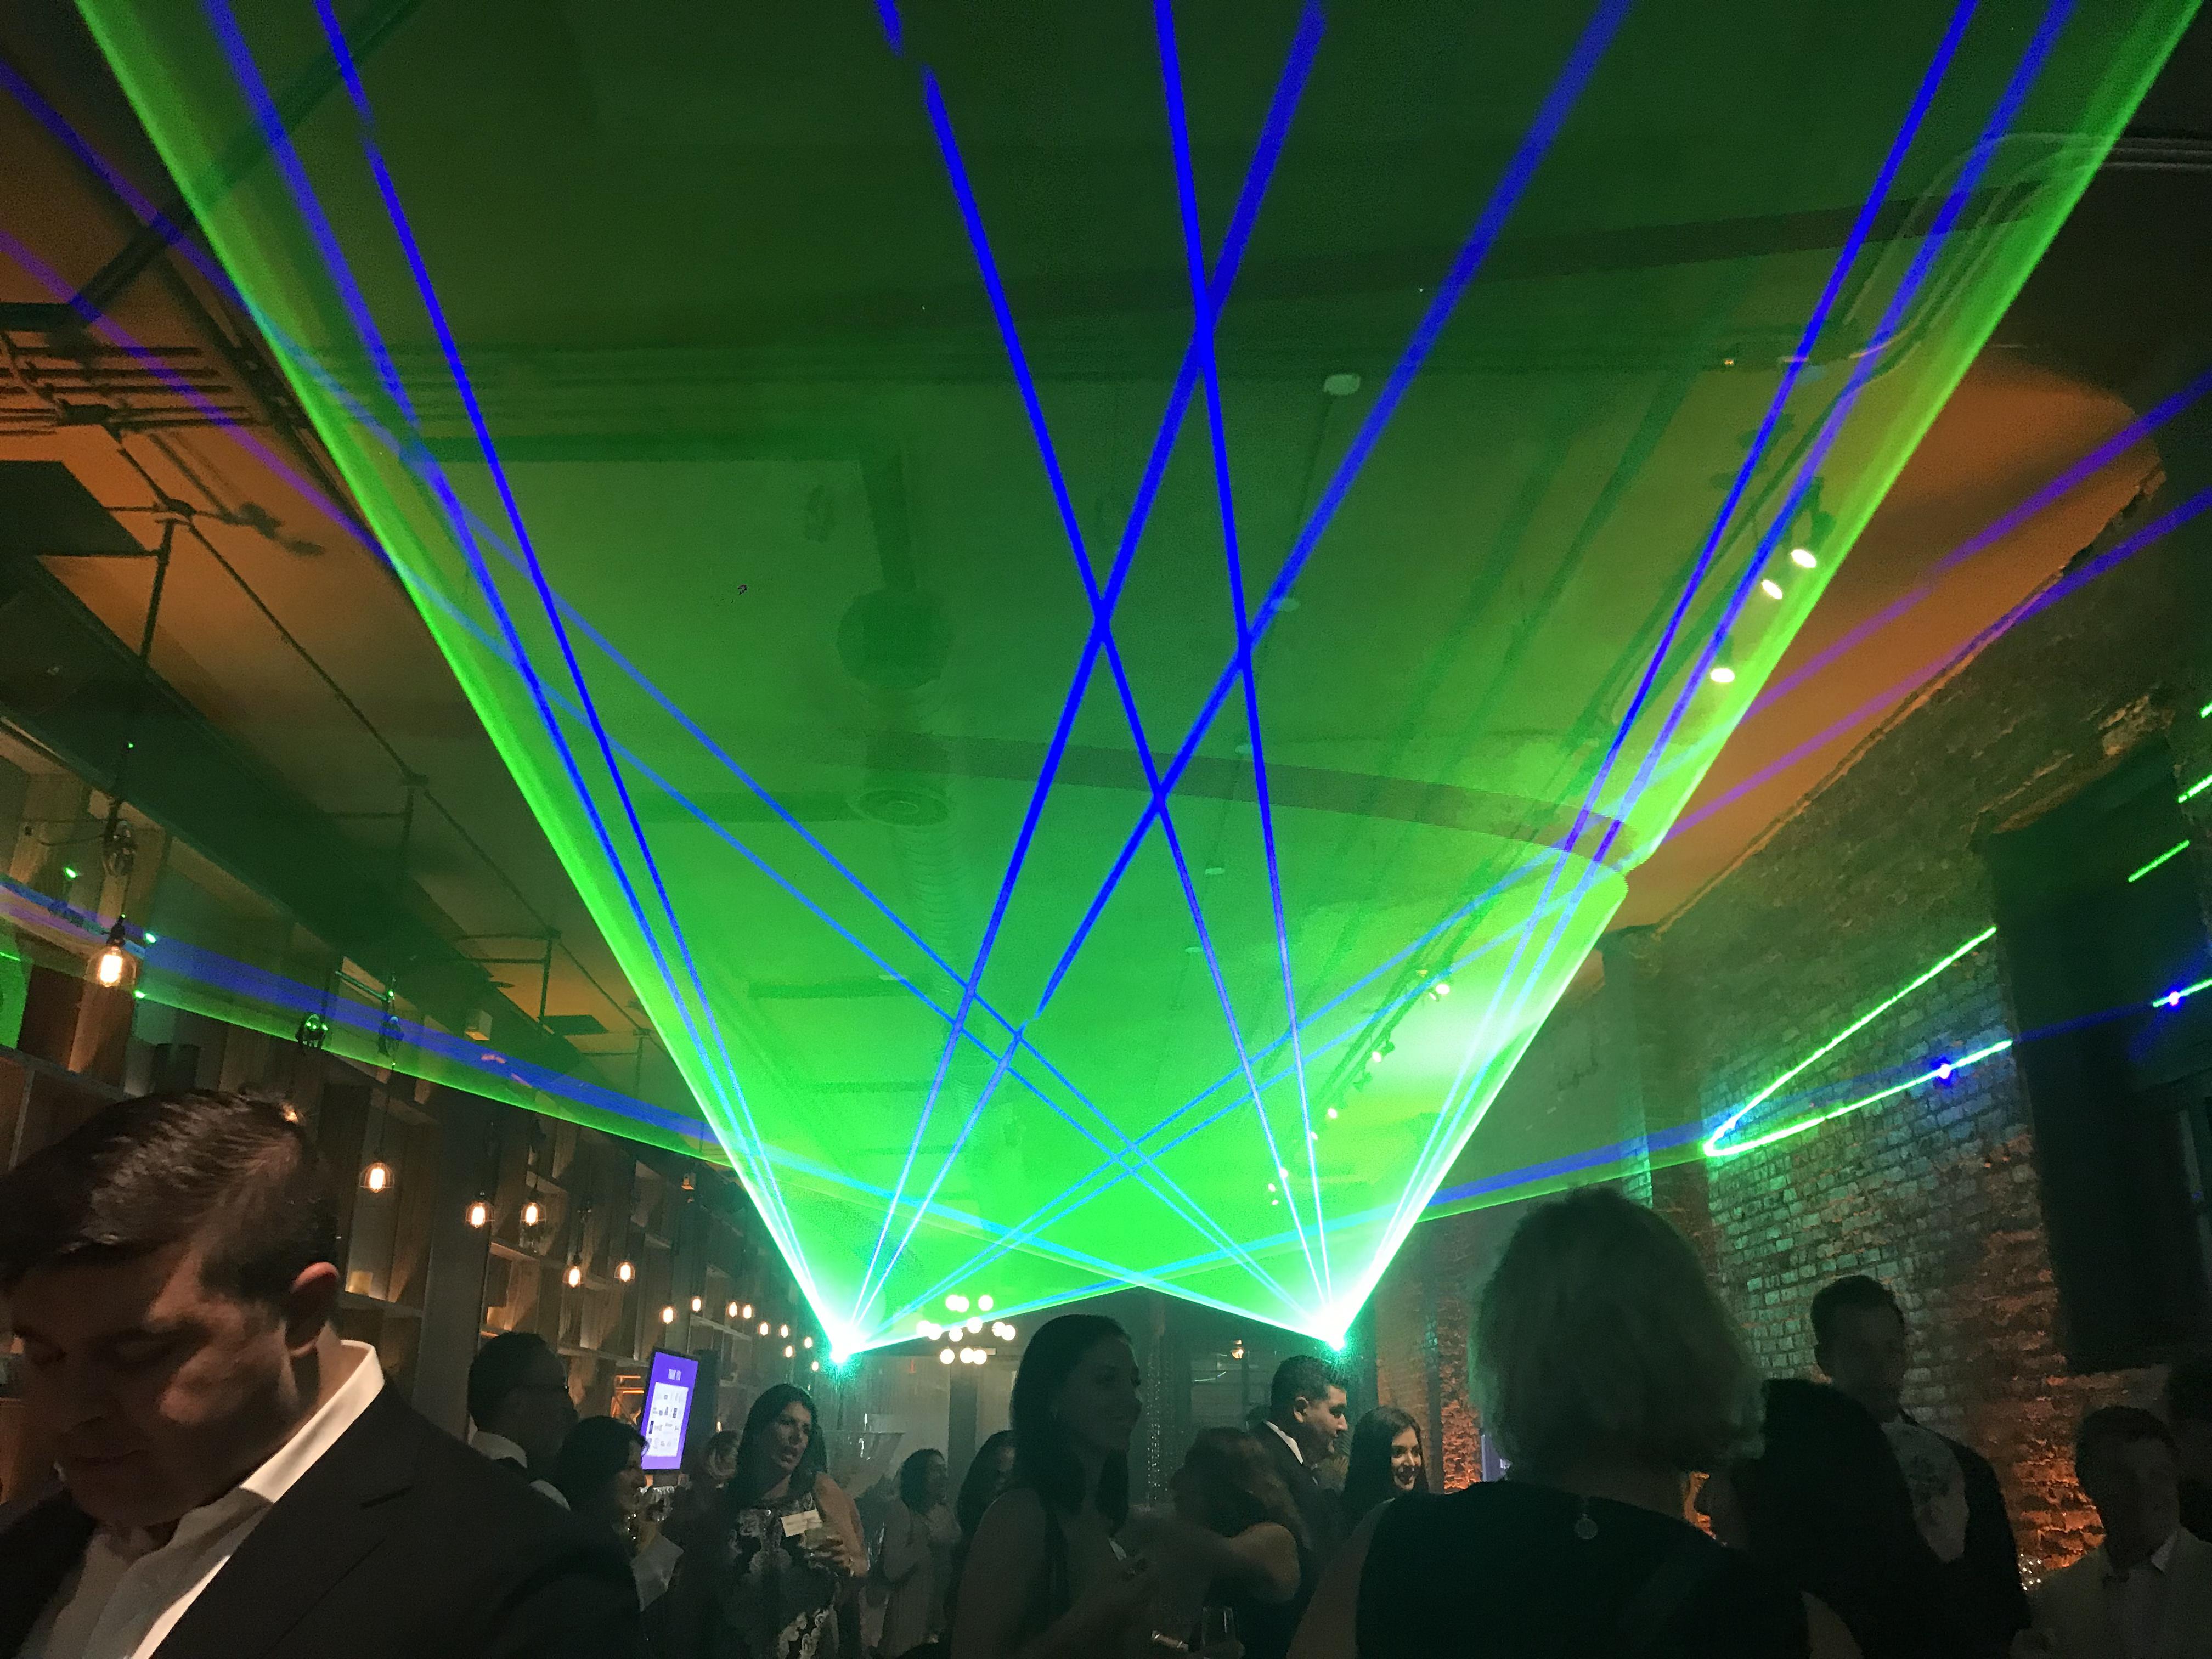 Laser Installation Concert Club Lasers